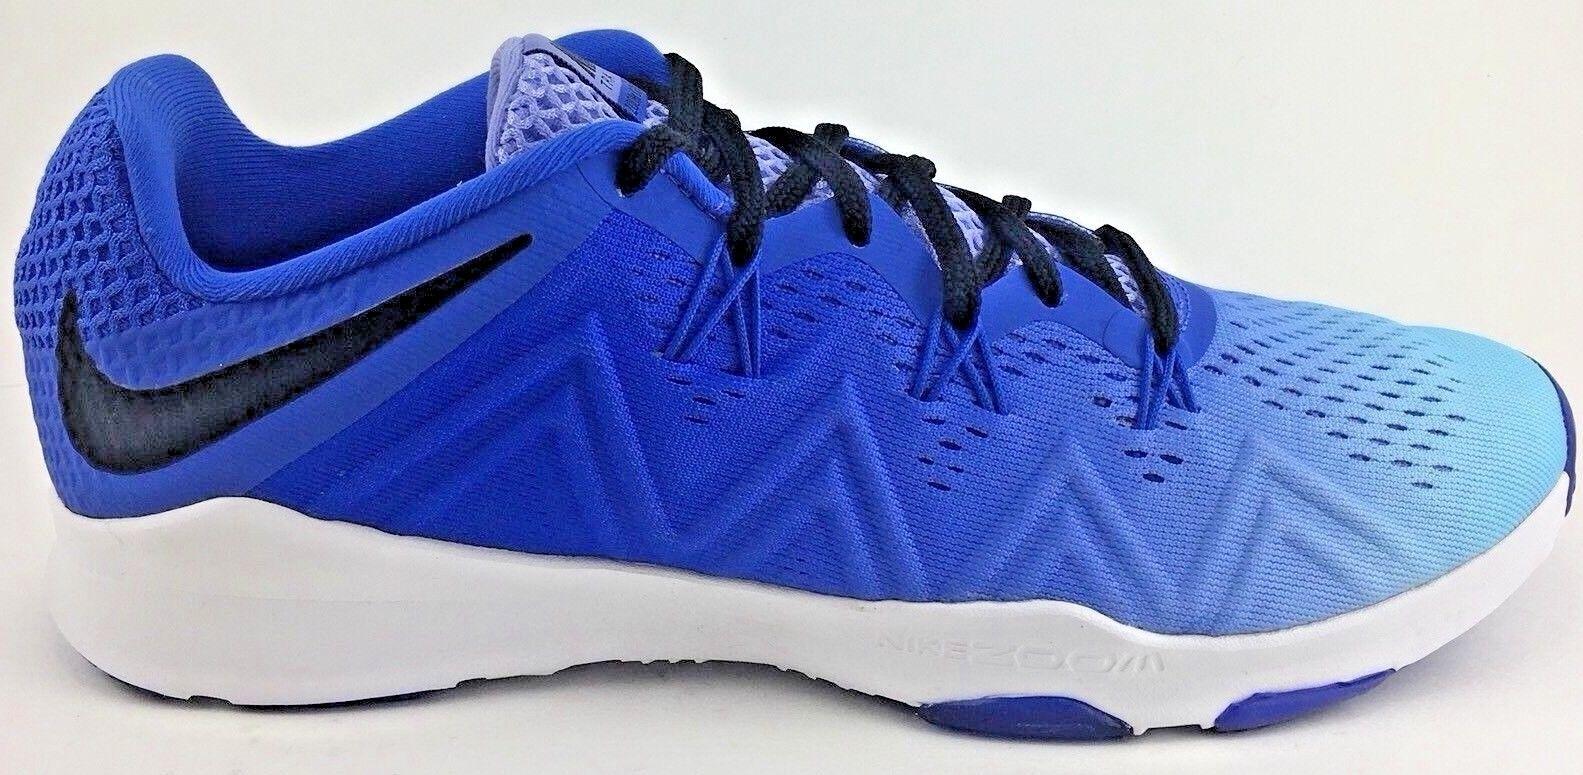 Nike Zoom Women's Size 8.5 Condition TR Cross Training Running Blue Shoe Sneaker